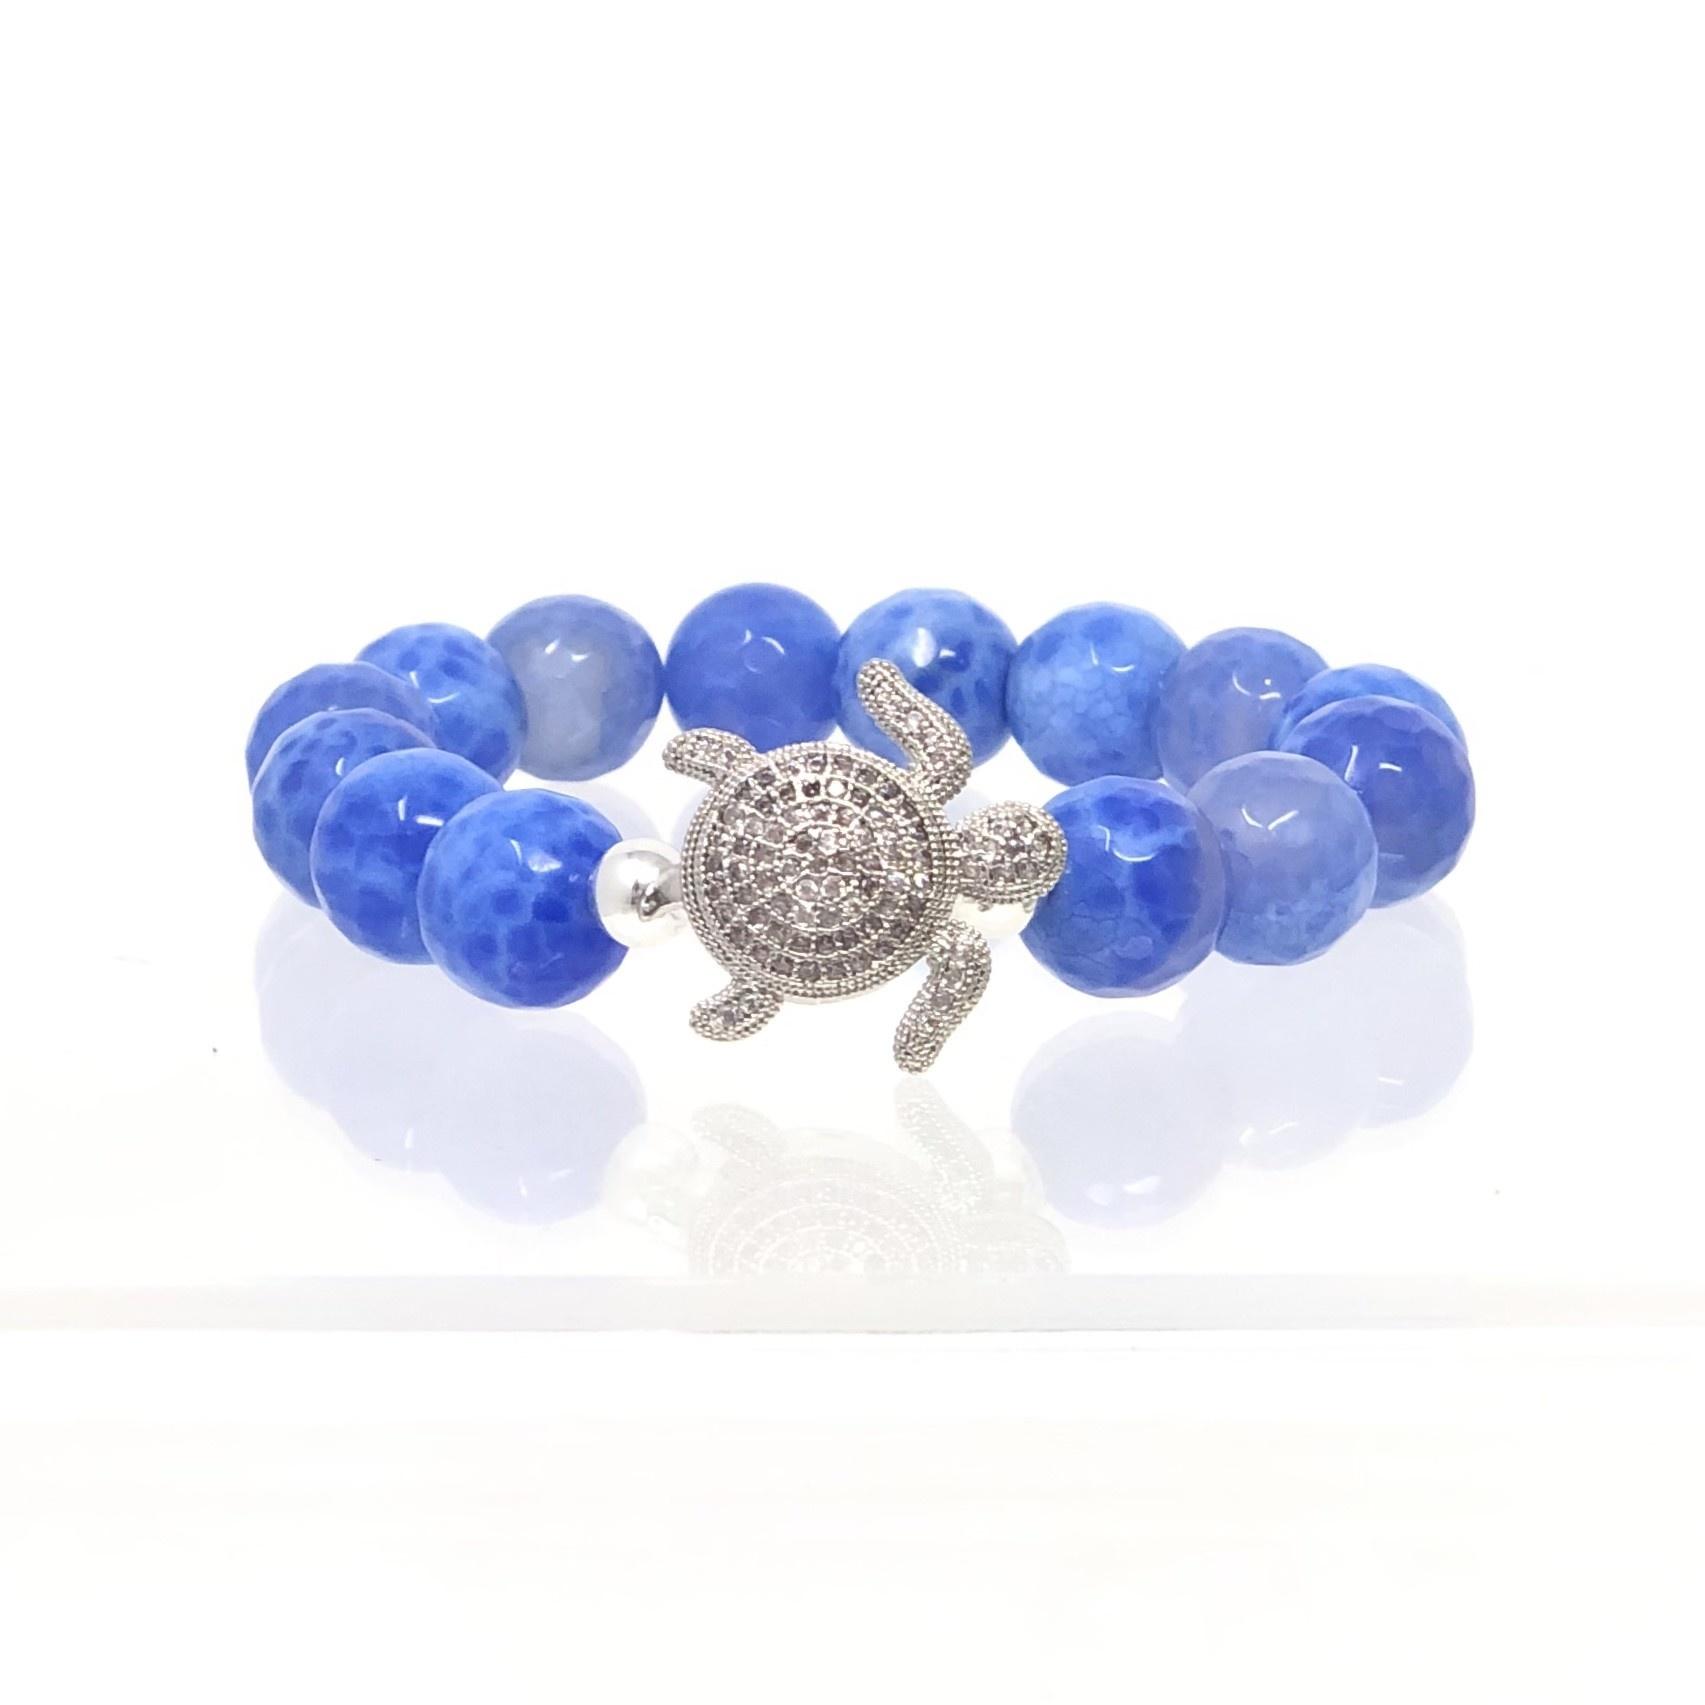 CZ Turtle & Periwinkle Agate Bracelet